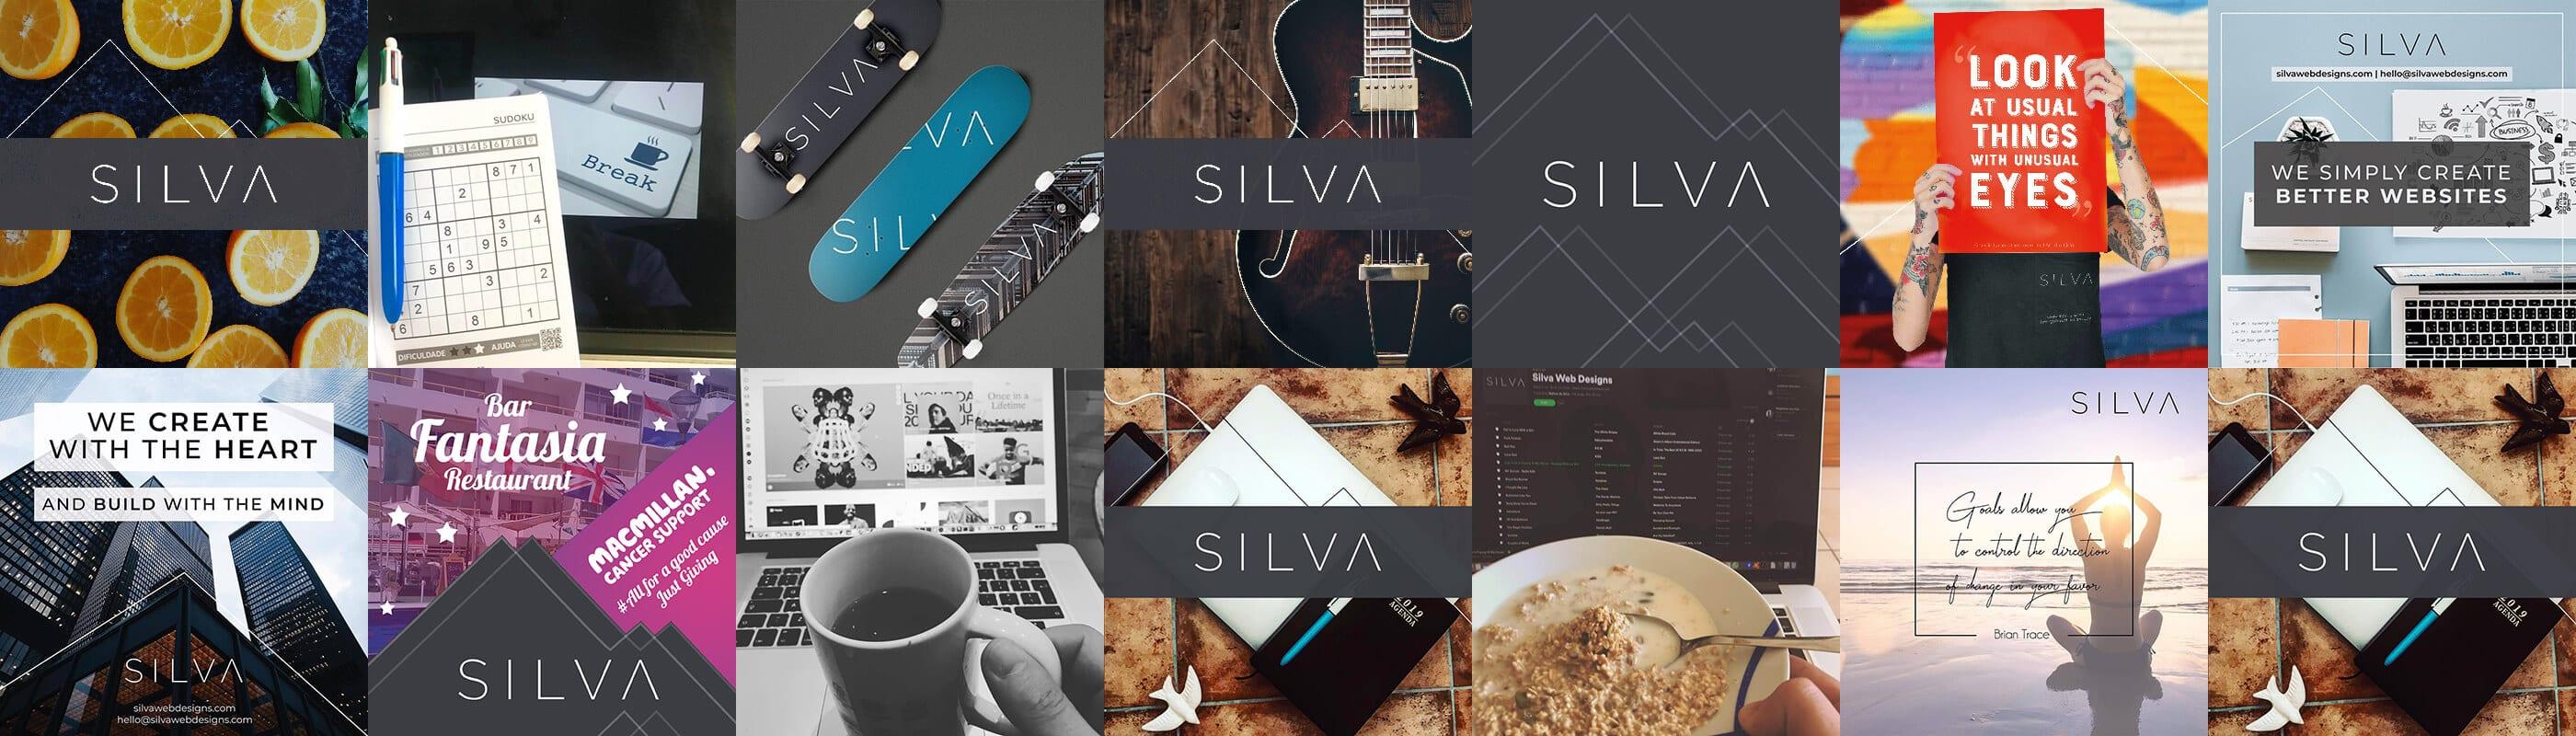 Silva Web Designs - Journey - Our Portfolio